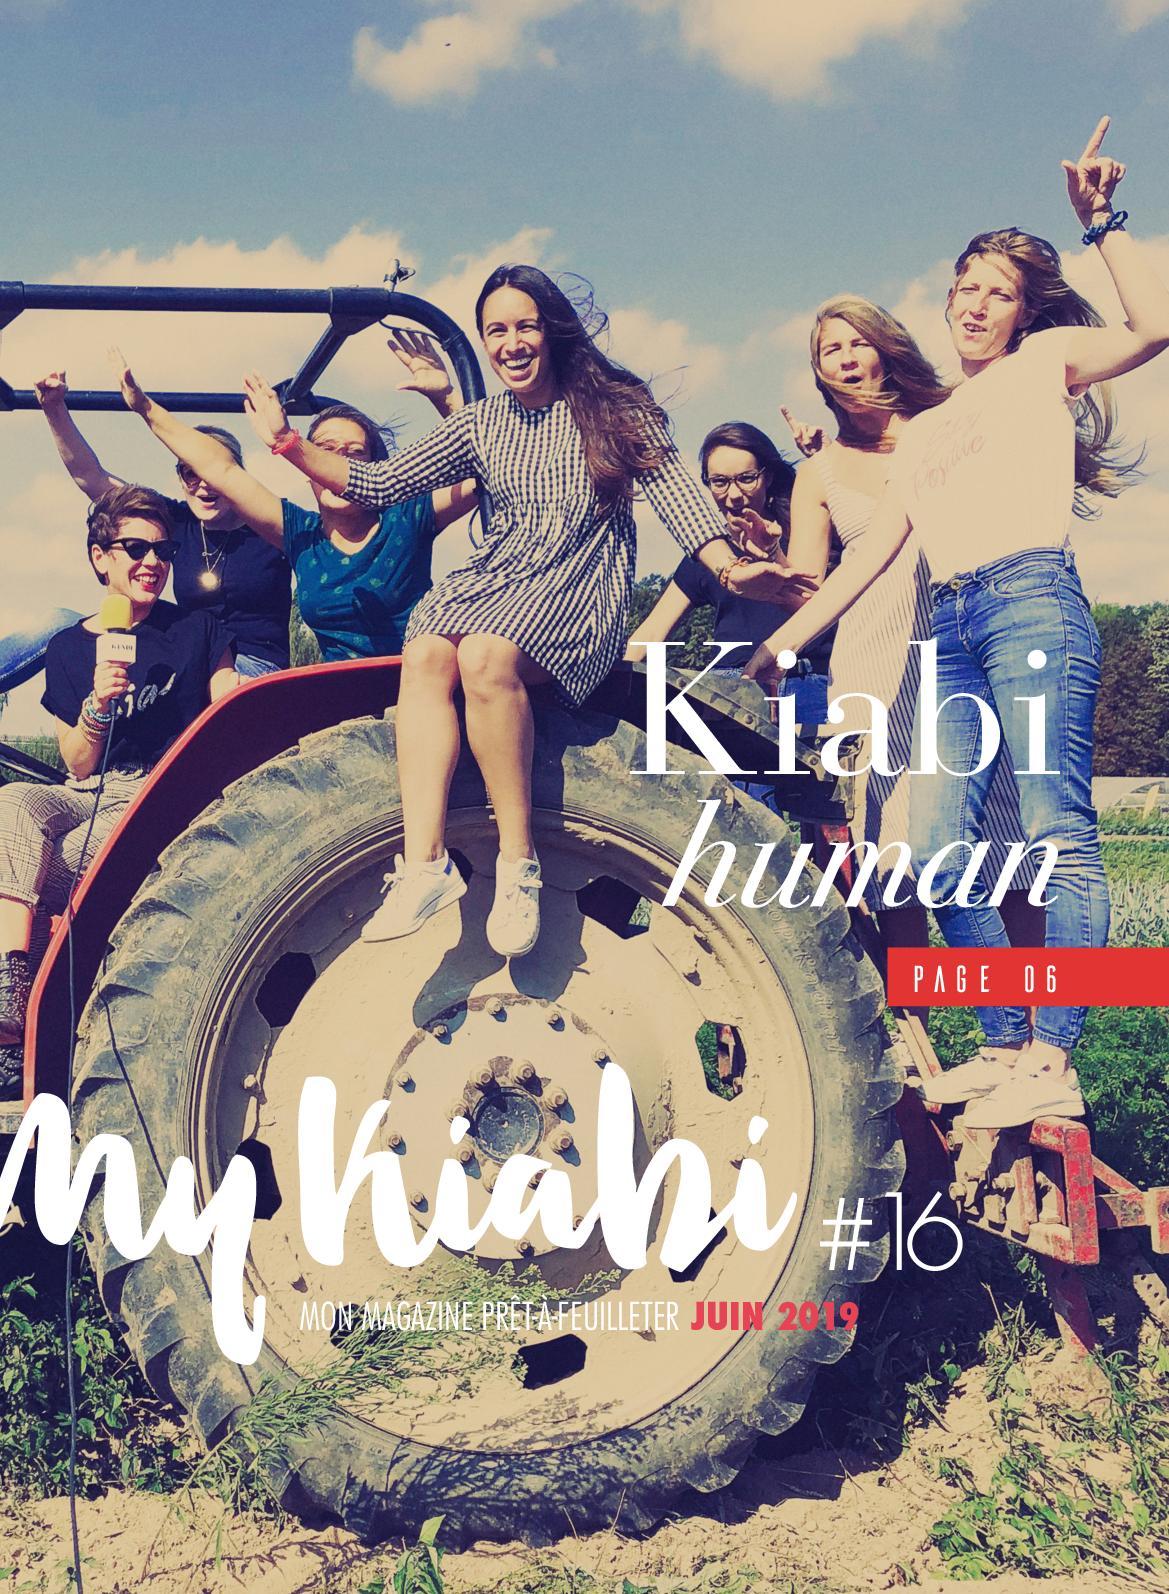 Kiabi.com/calendrier-bonheur : kiabi.com/calendrier-bonheur, Calaméo, Kiabi